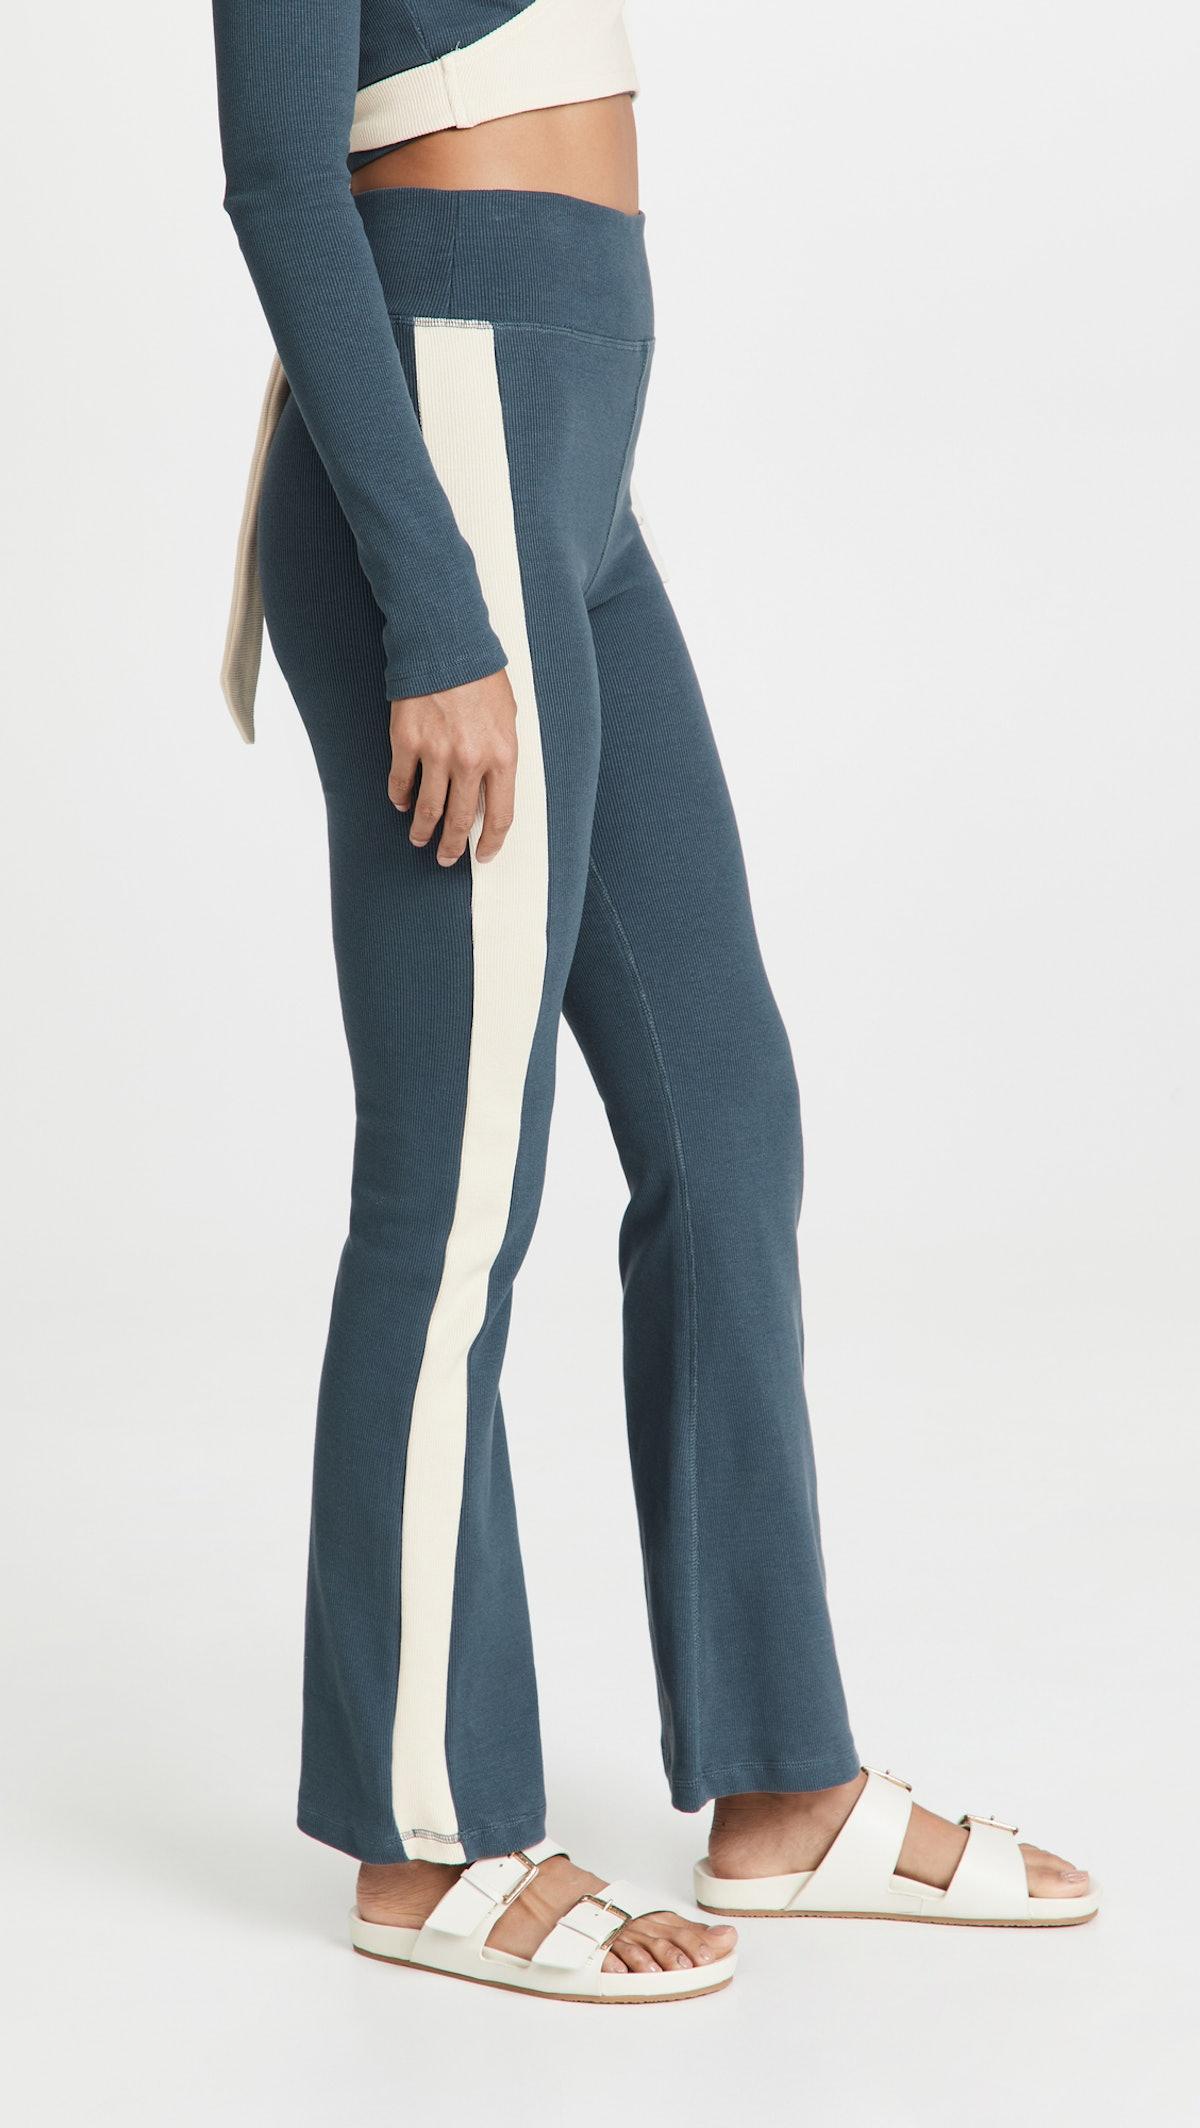 Luna Rib Florence Flare Pants